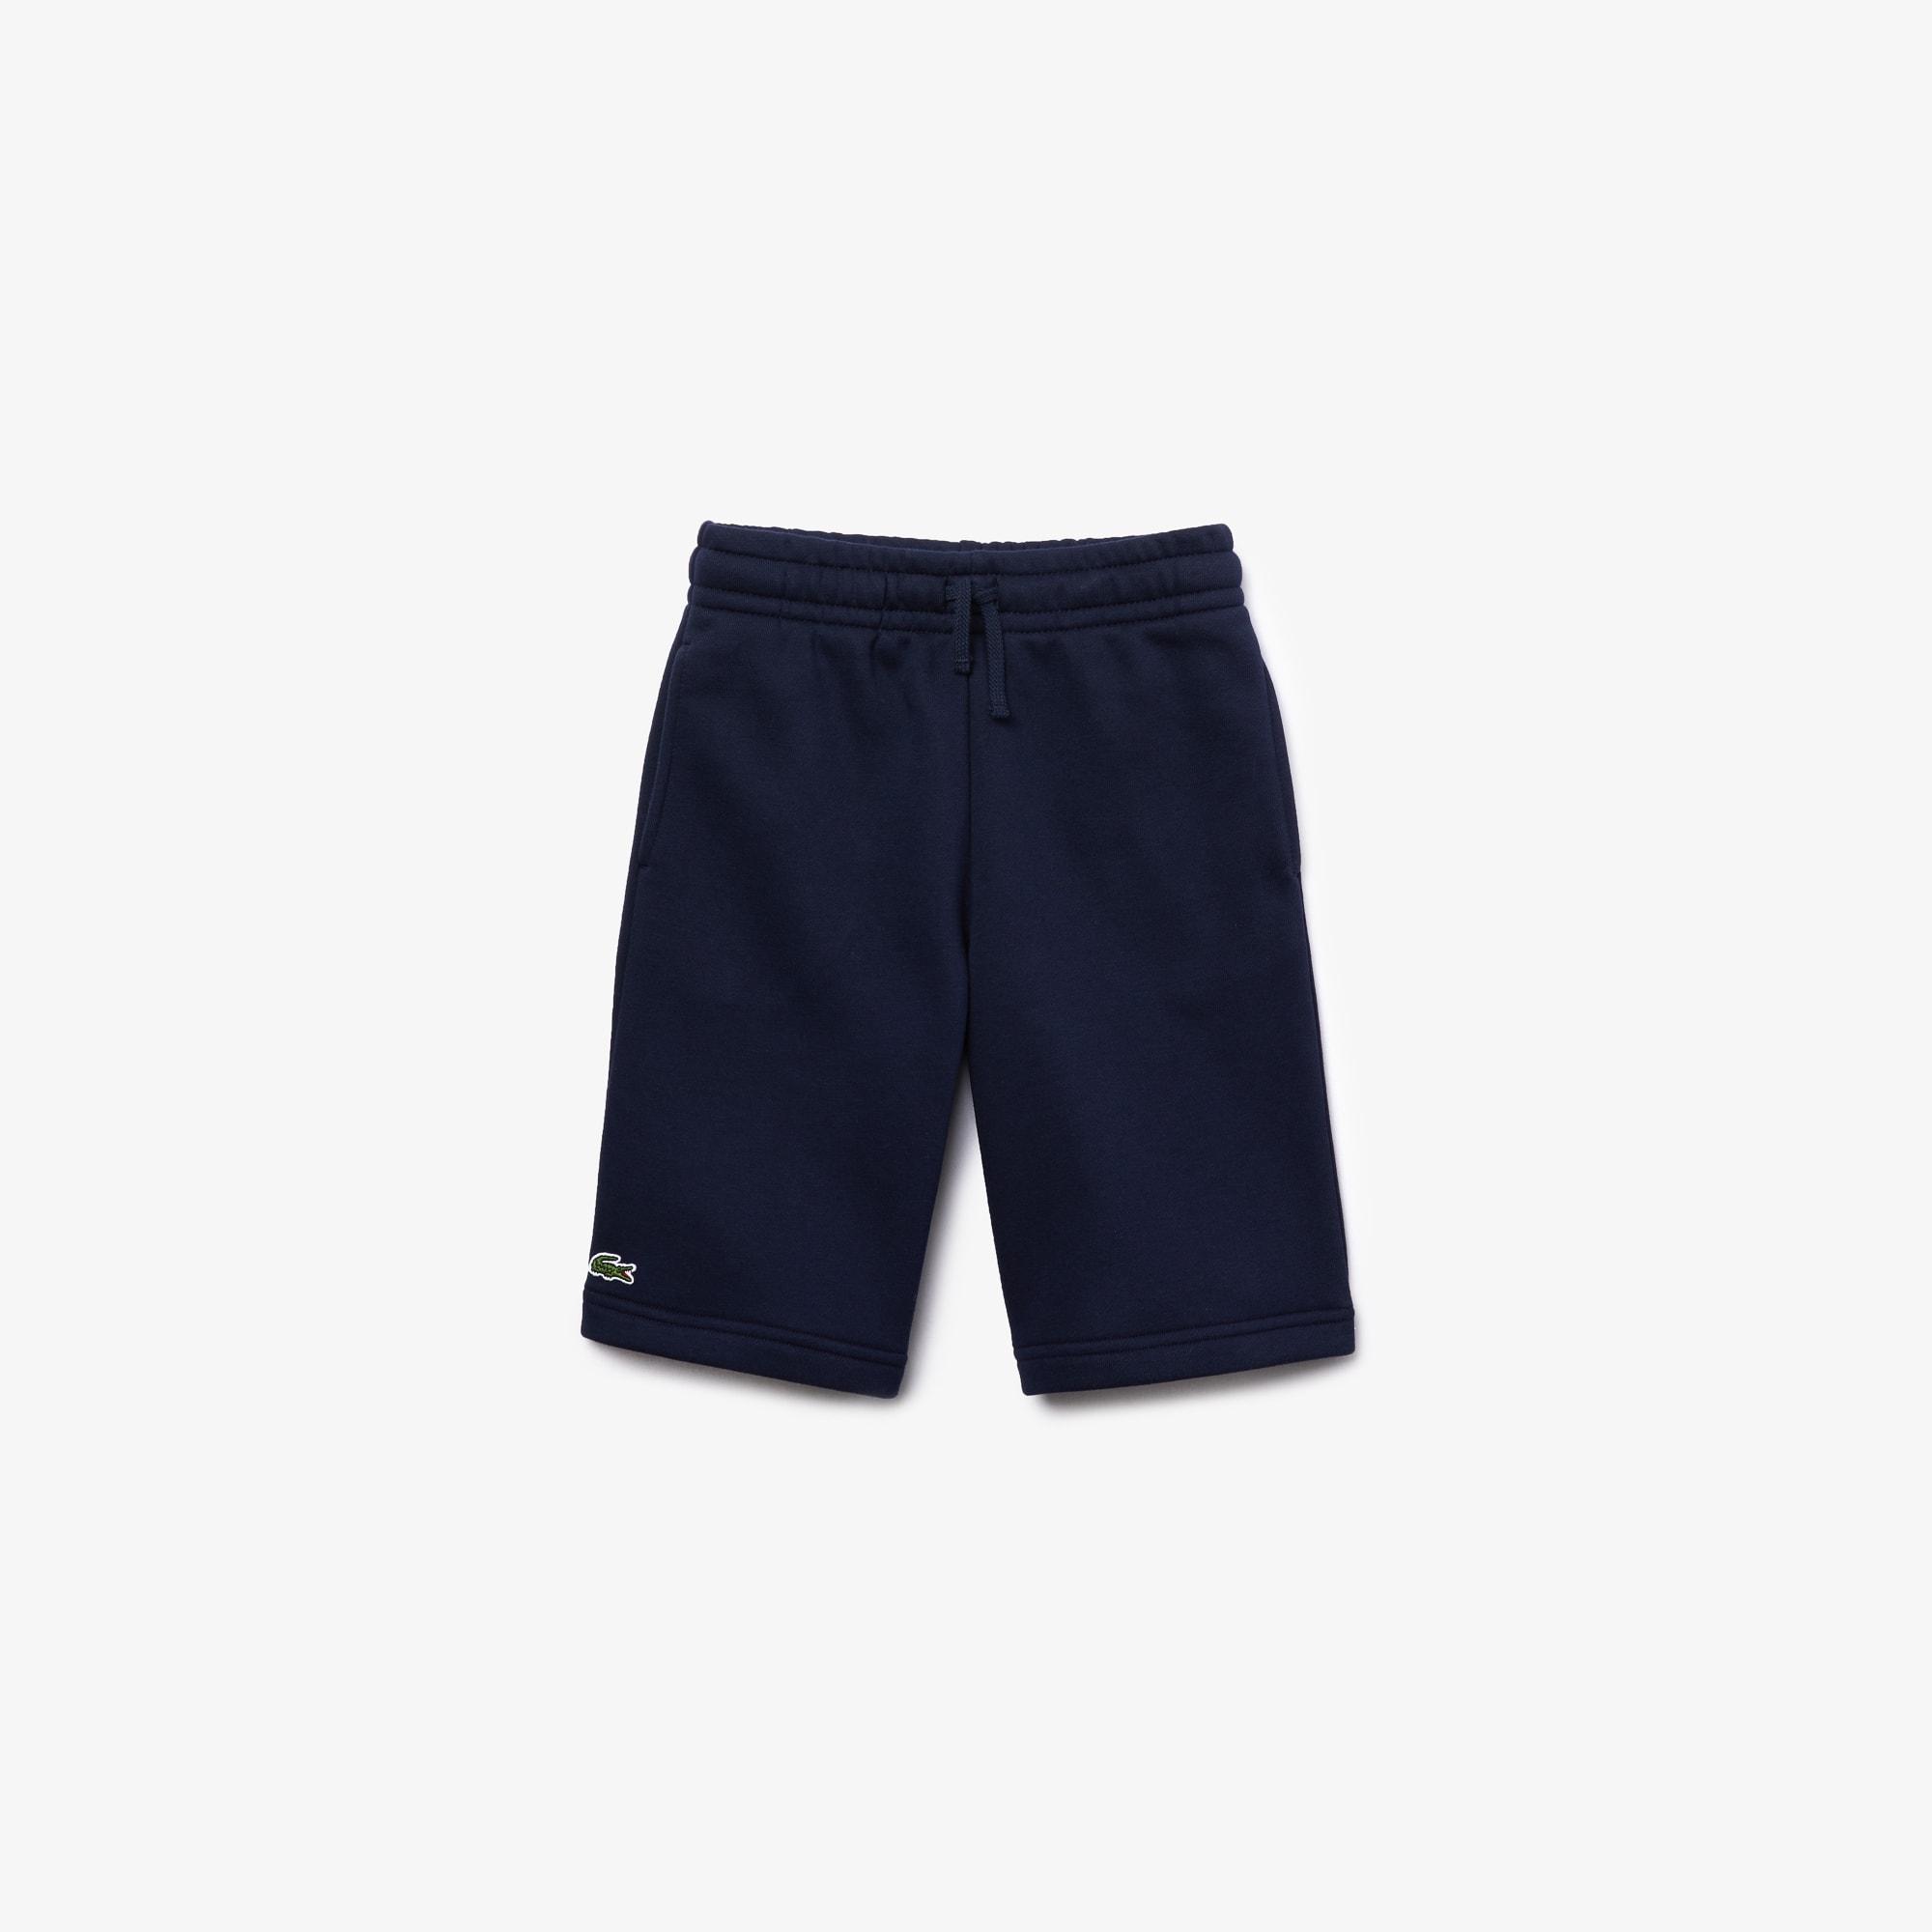 Pantalón corto de niño Lacoste SPORT Tennis en felpa de algodón